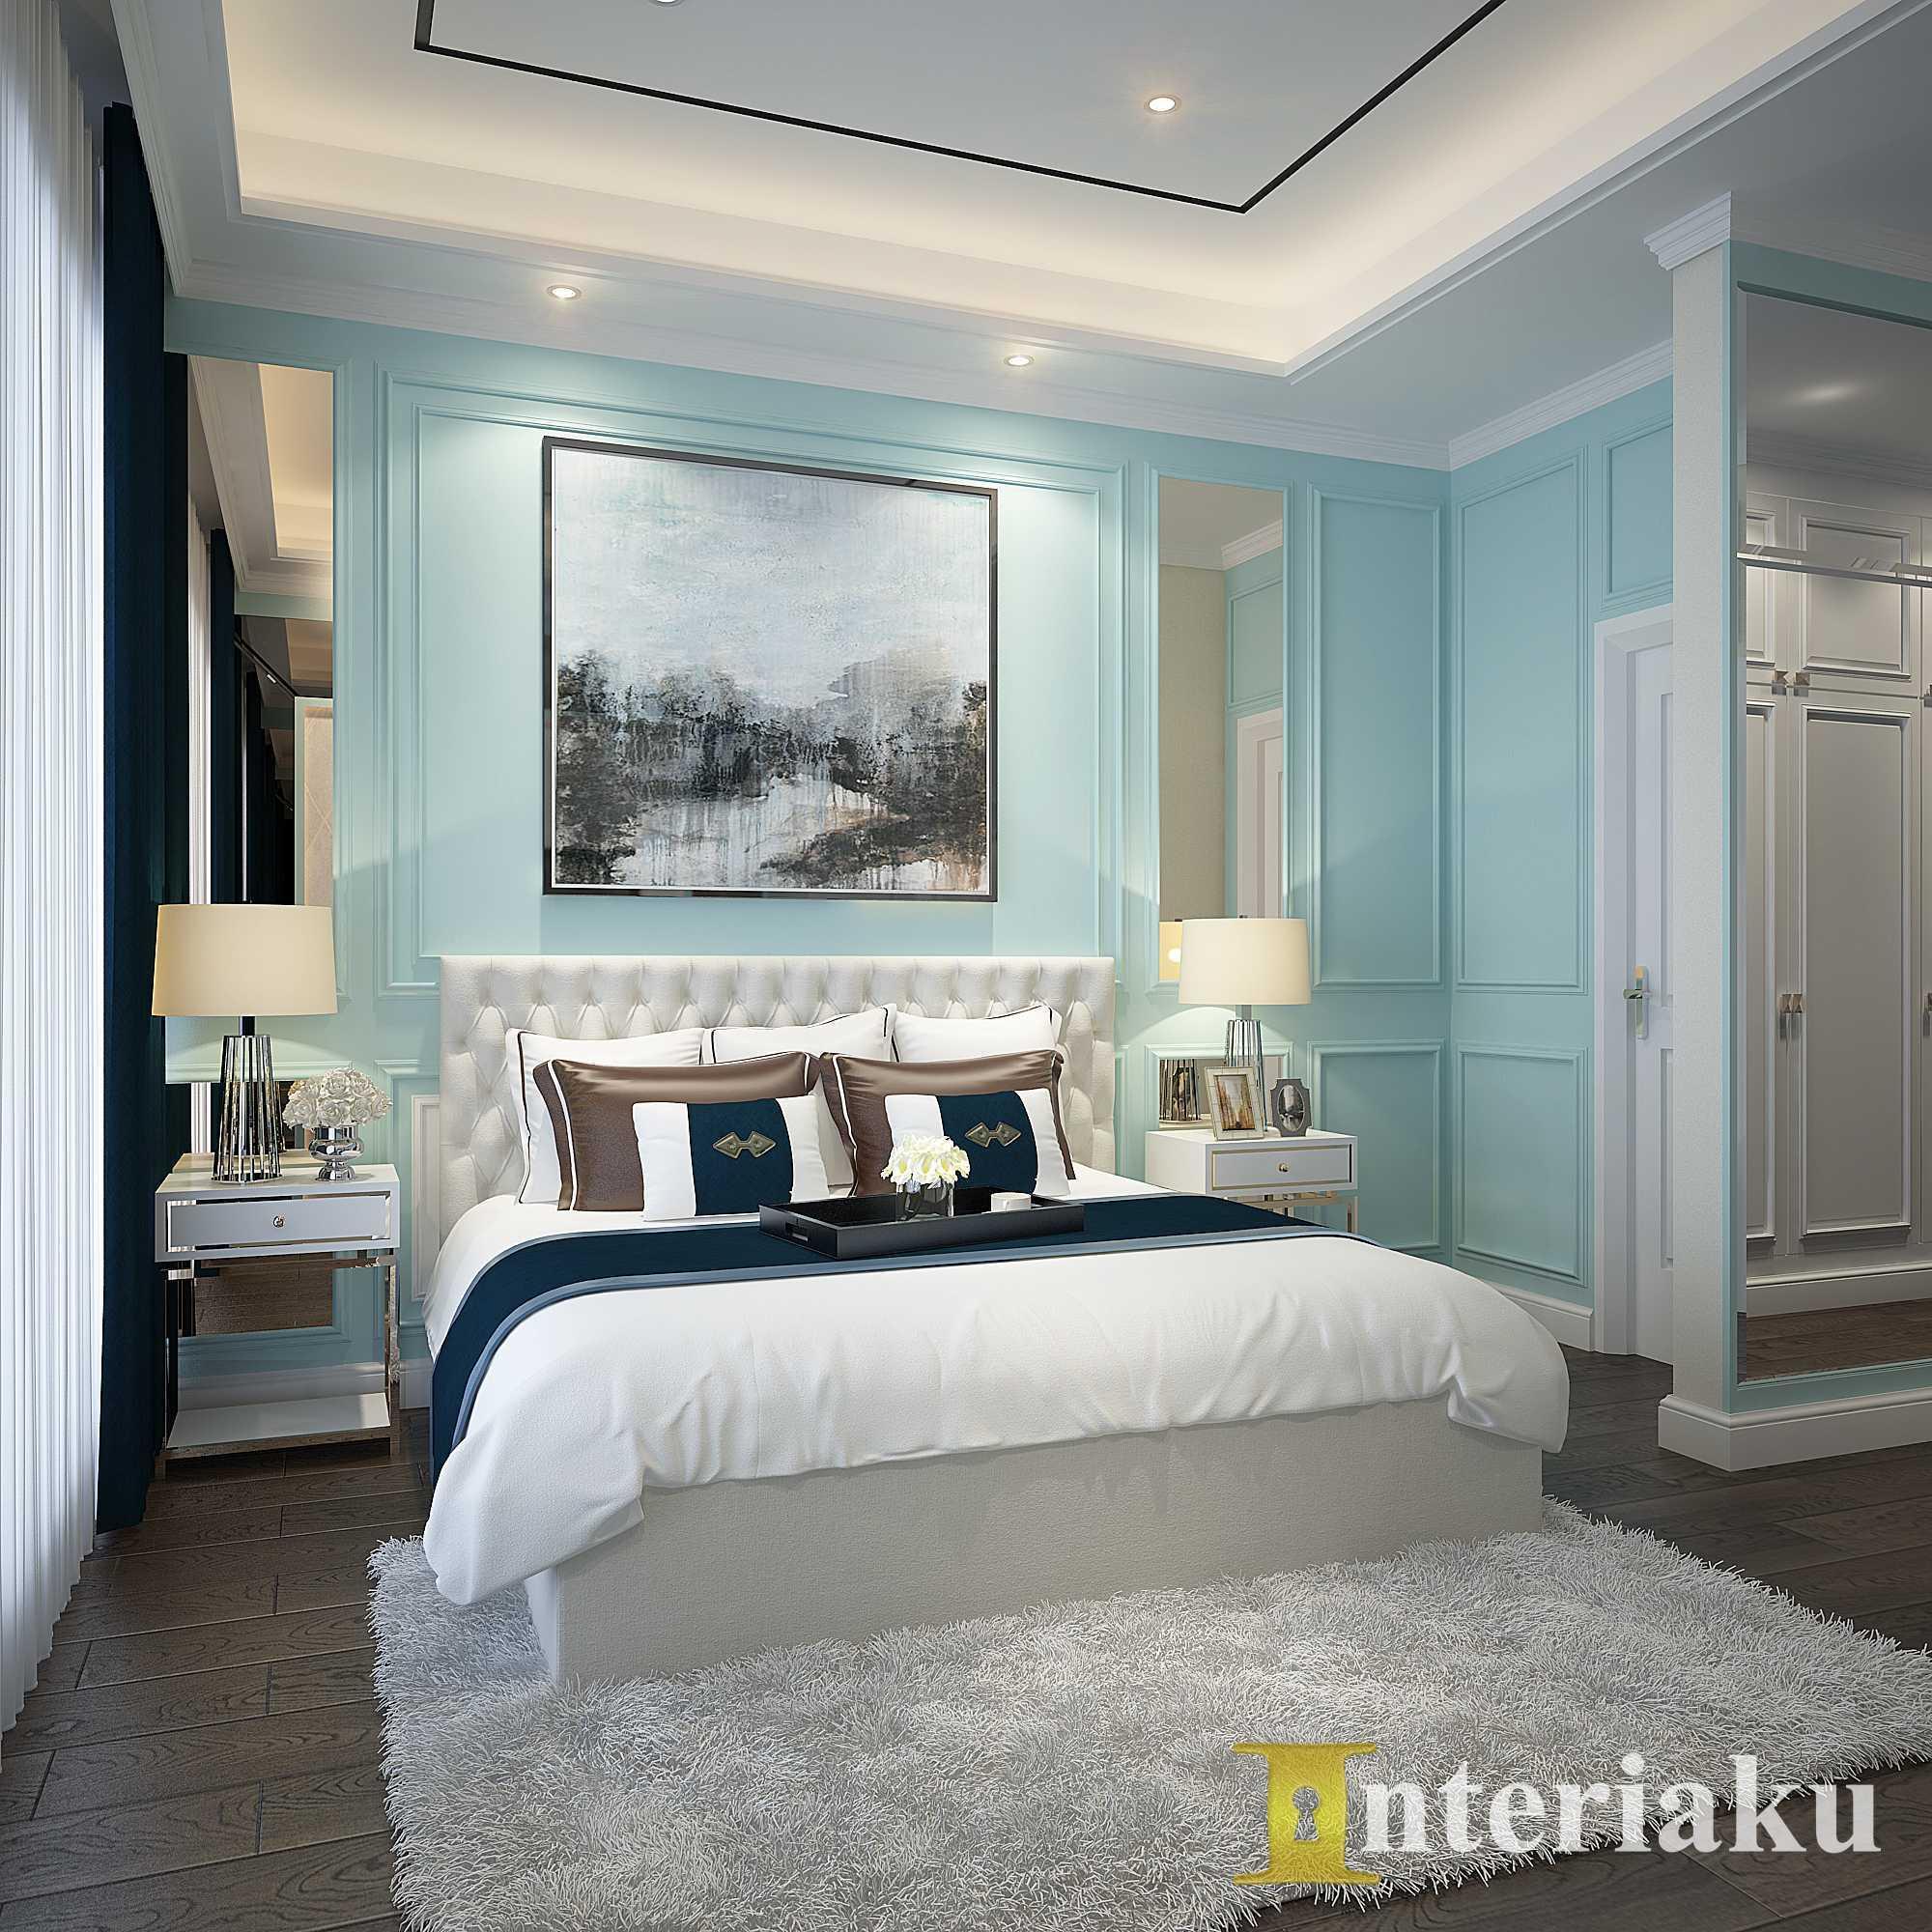 Interiaku Classic Minimalist Bedroom Kabupaten Ciamis, Jawa Barat, Indonesia Kabupaten Ciamis, Jawa Barat, Indonesia Interiaku-Classic-Minimalist-Bedroom  67911